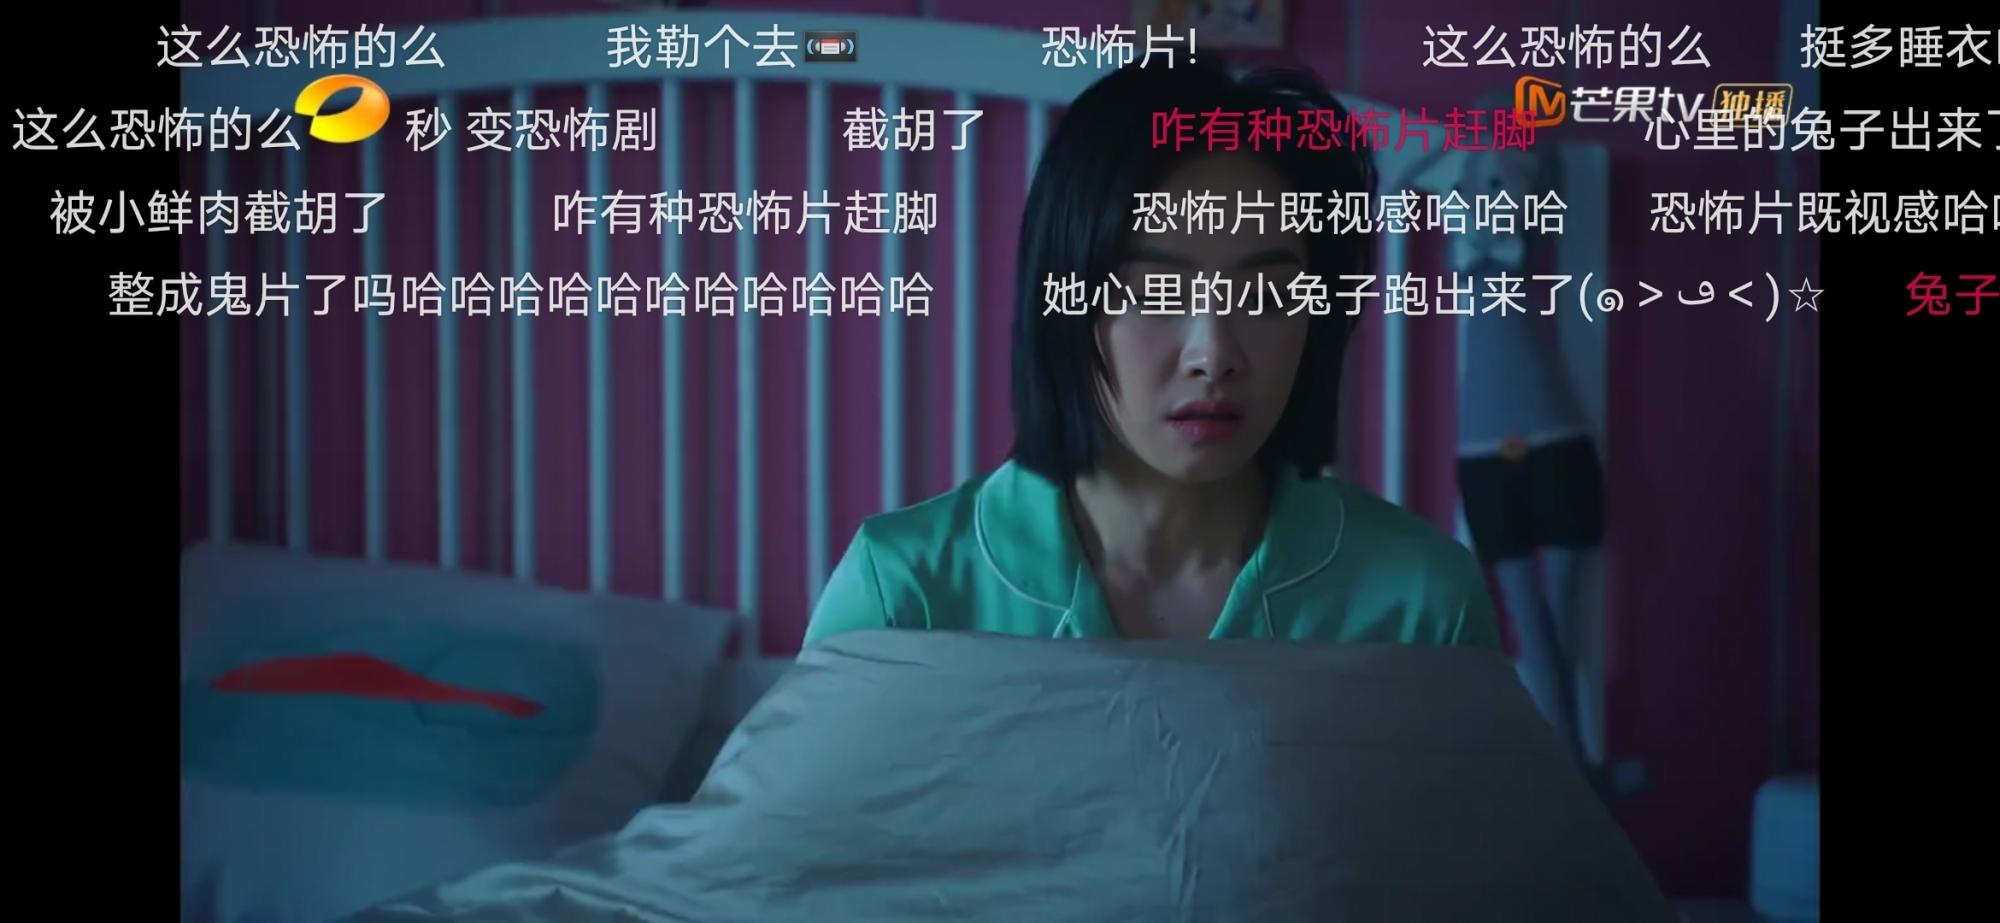 Screenshot_20200214_101536_com.huawei.himovie.jpg